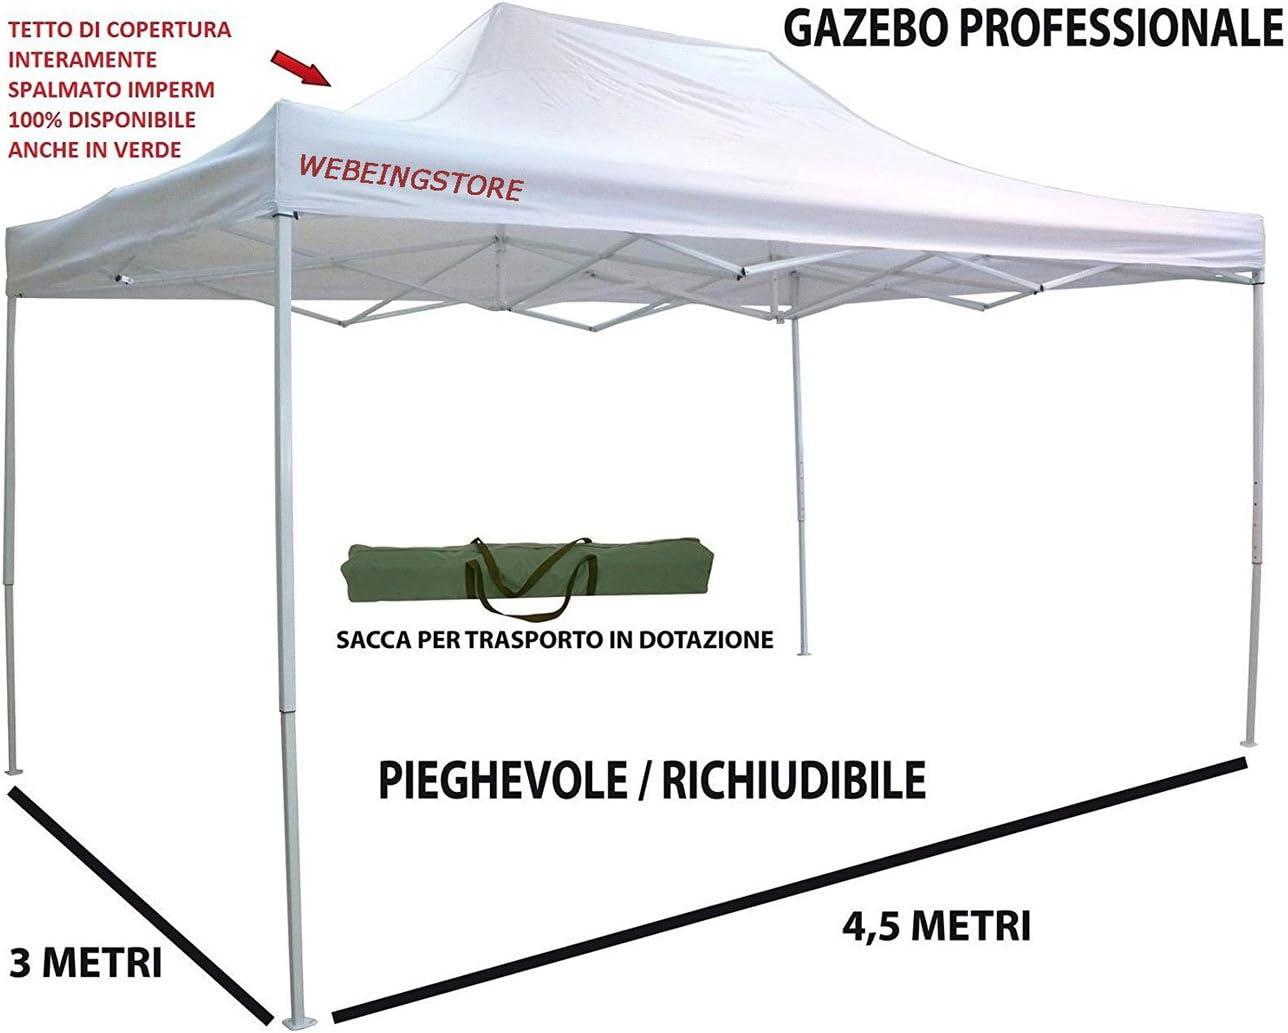 Cenador plegable impermeable de aluminio 3 x 4, 5 m para jardín, mercados, ferias, blanco Mod. Maiori.: Amazon.es: Jardín